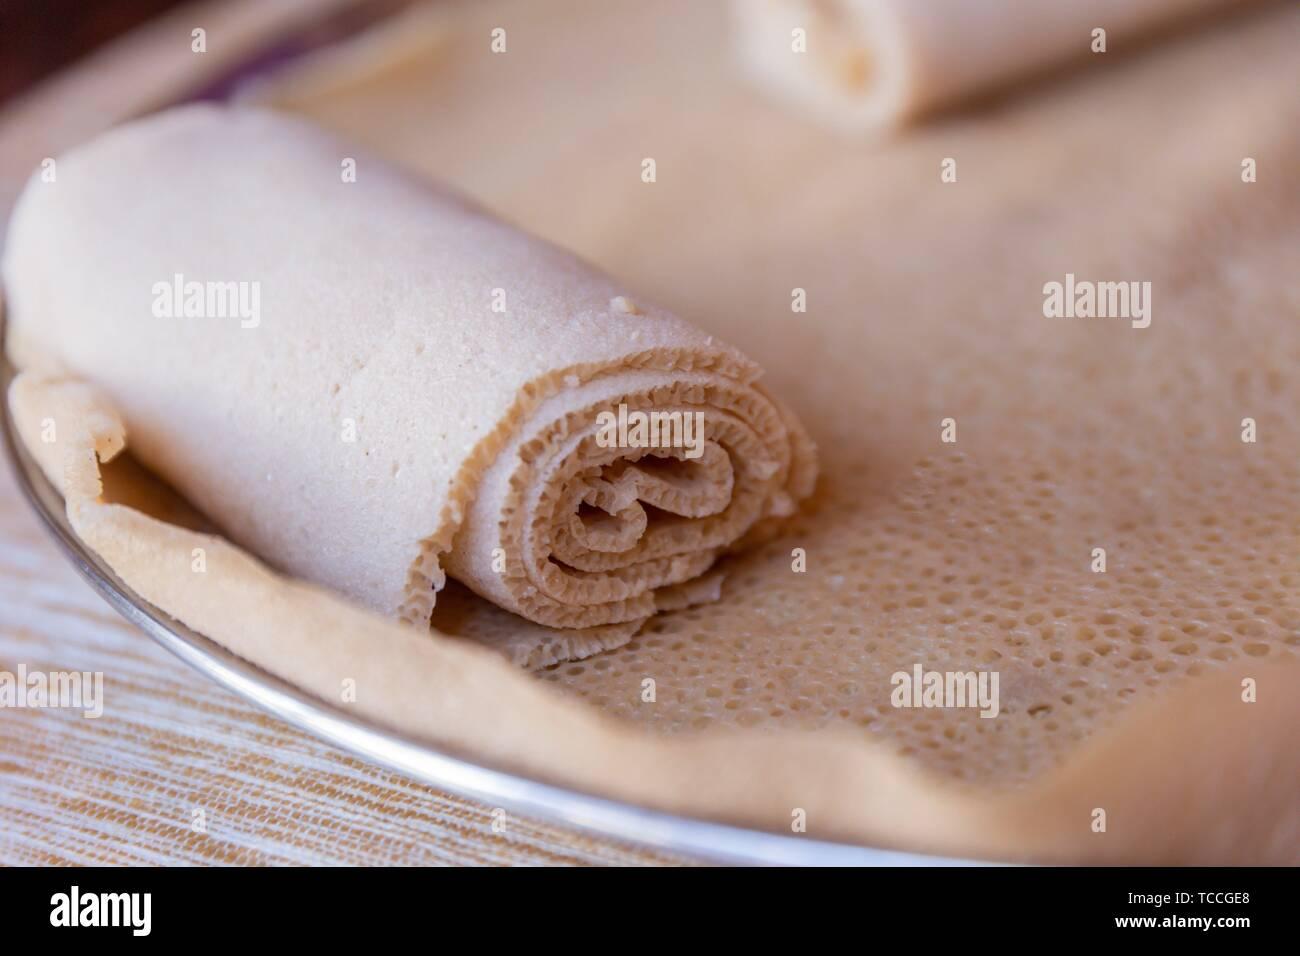 Injera is a sourdough flatbread made from teff flour. It is the national dish of Ethiopia, Eritrea, Somalia and Djibouti. Stock Photo